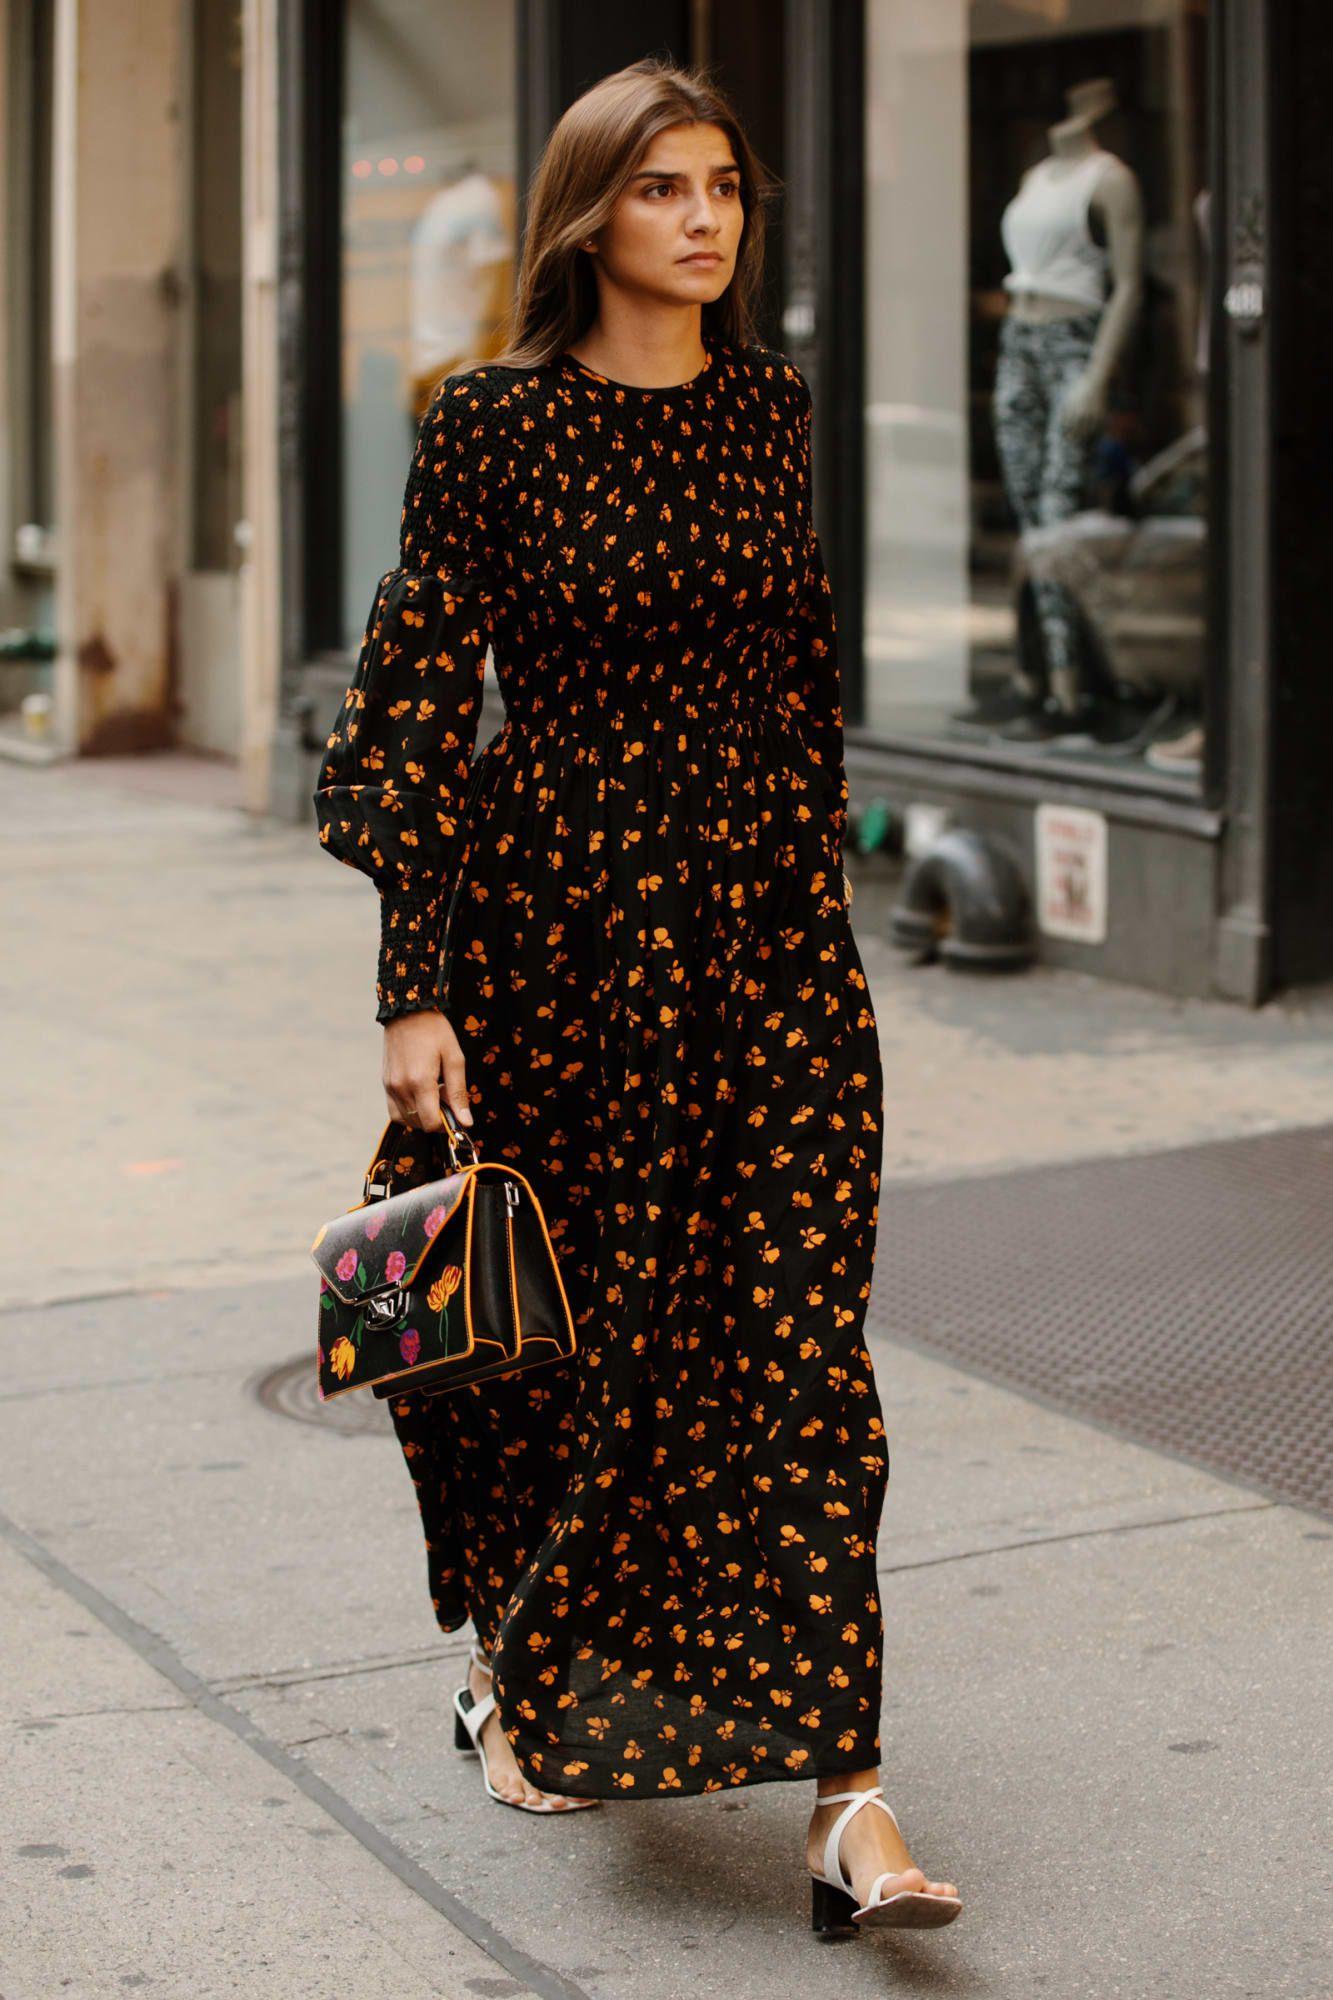 Street Style Twinning Happened On Day 5 of New York Fashion Week #streetstyleclothing